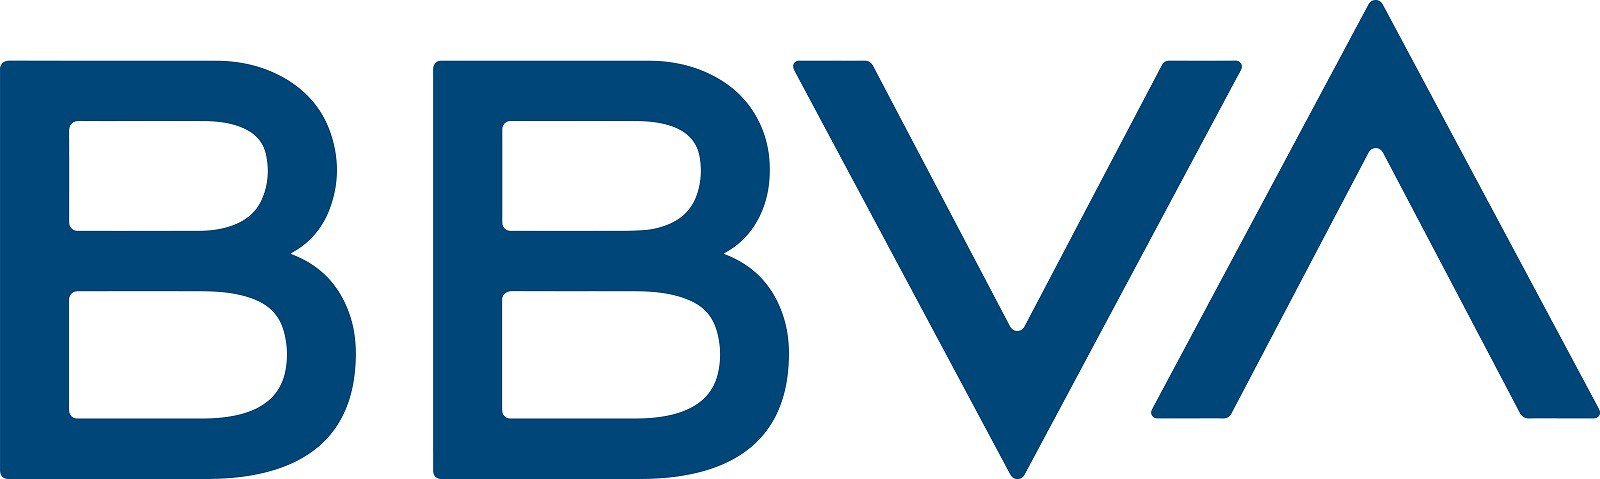 BBVA Logo   New png